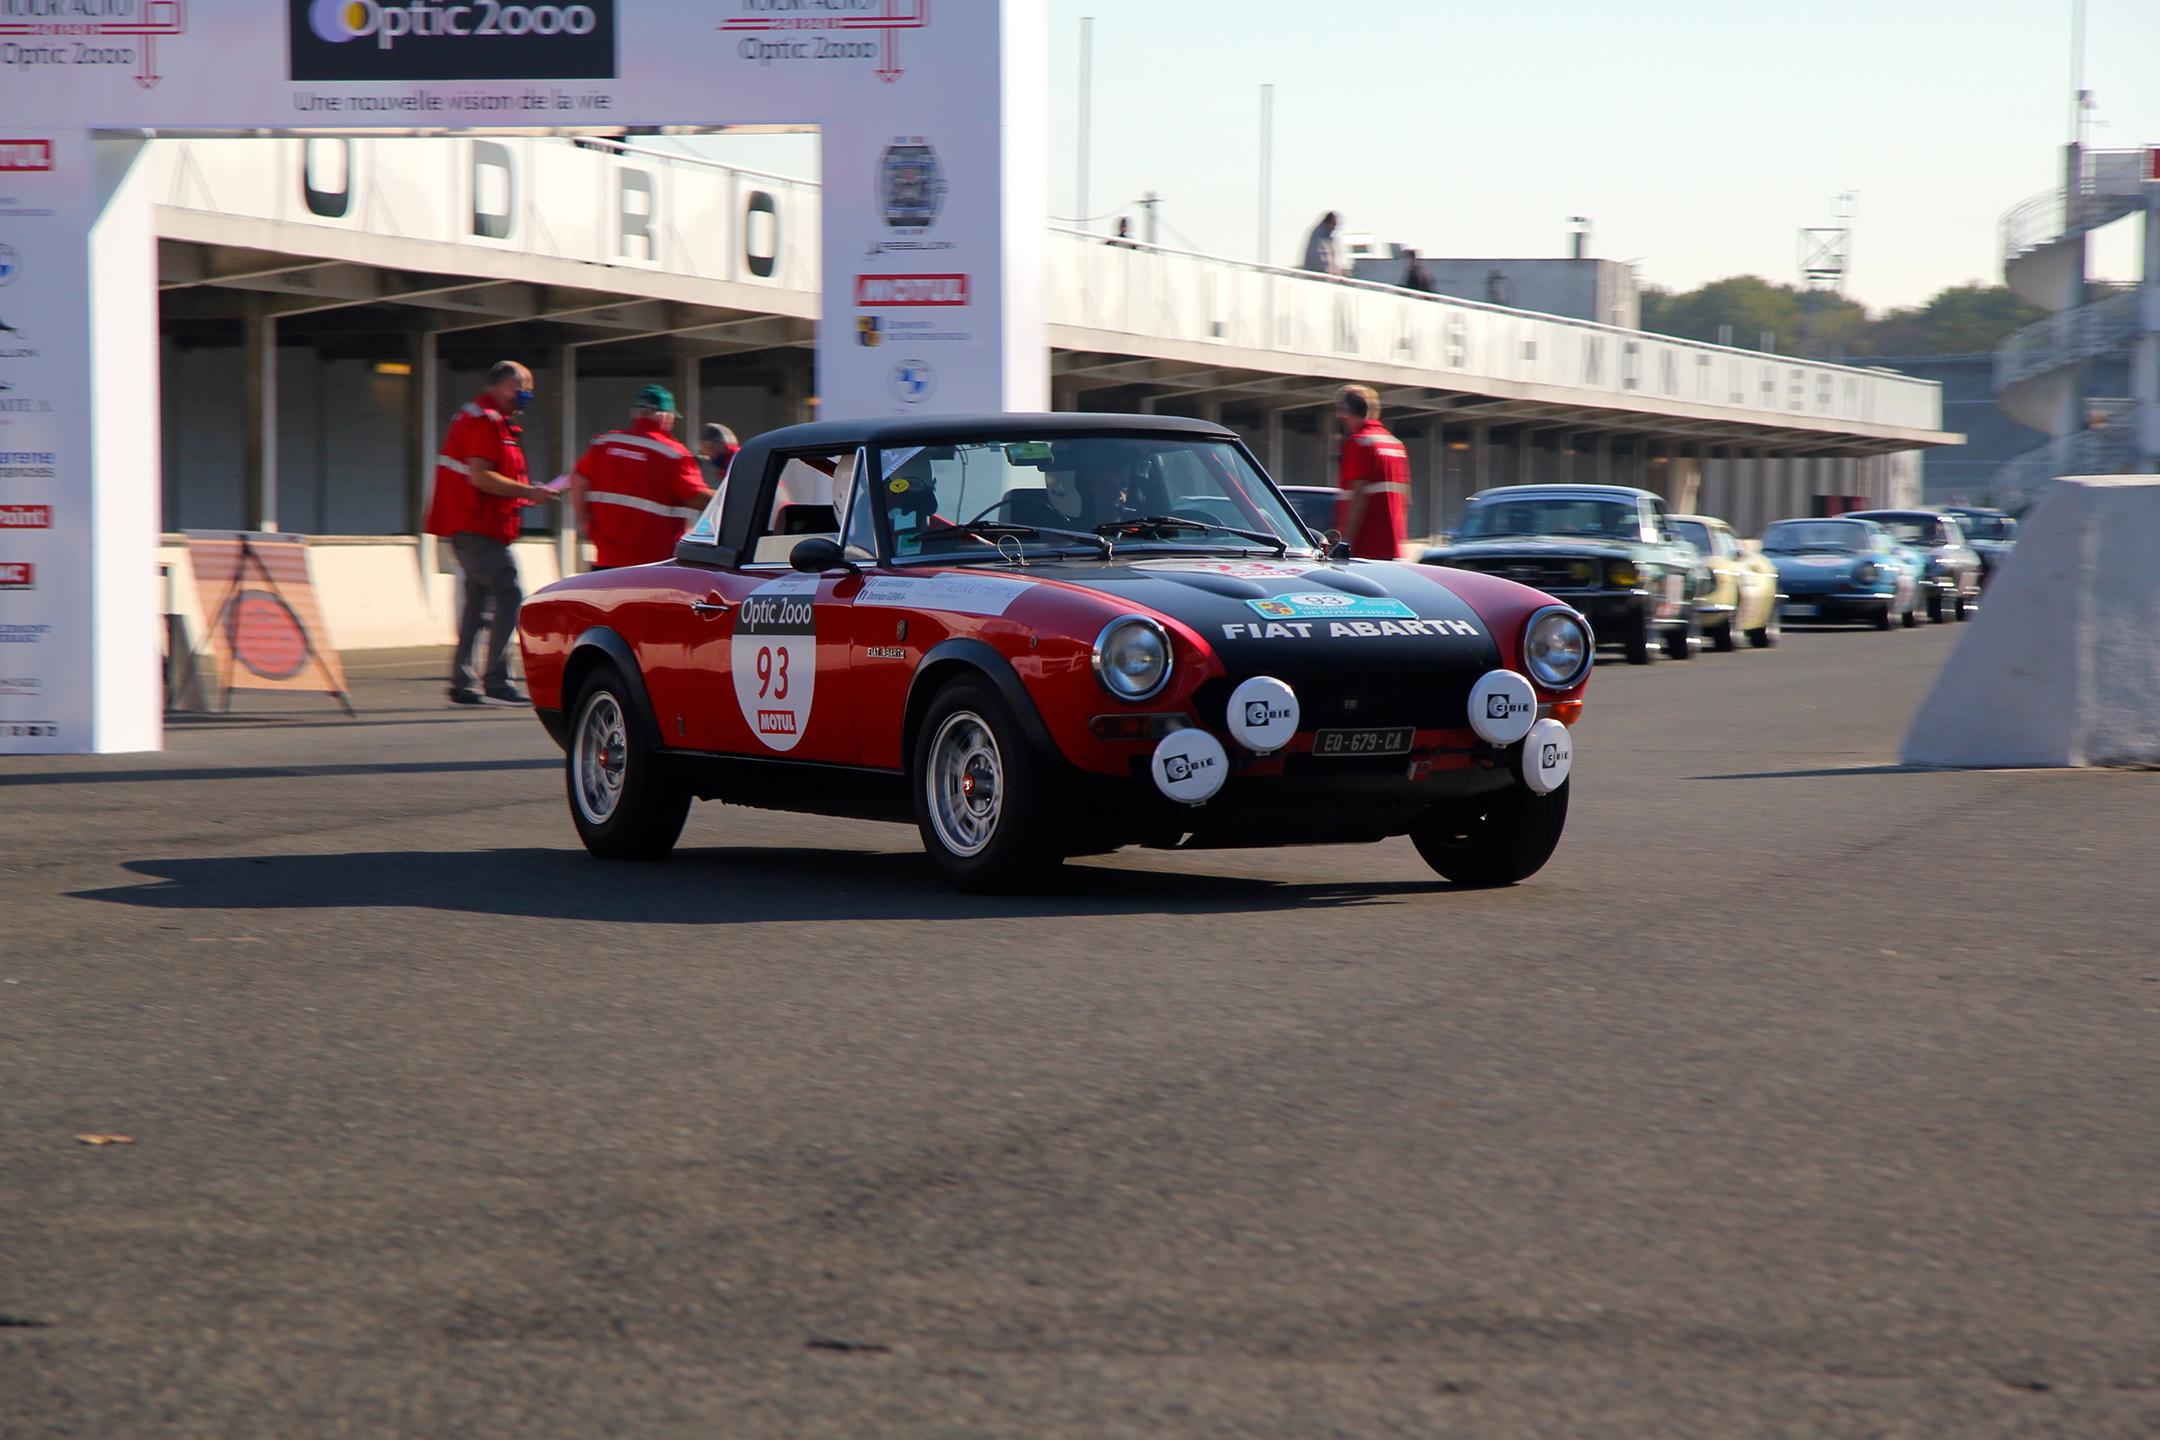 Fiat 124 Abarth 1973 - Autodrome de Linas-Monthléry - Tour Auto 2020 - photo Ludo Ferrari